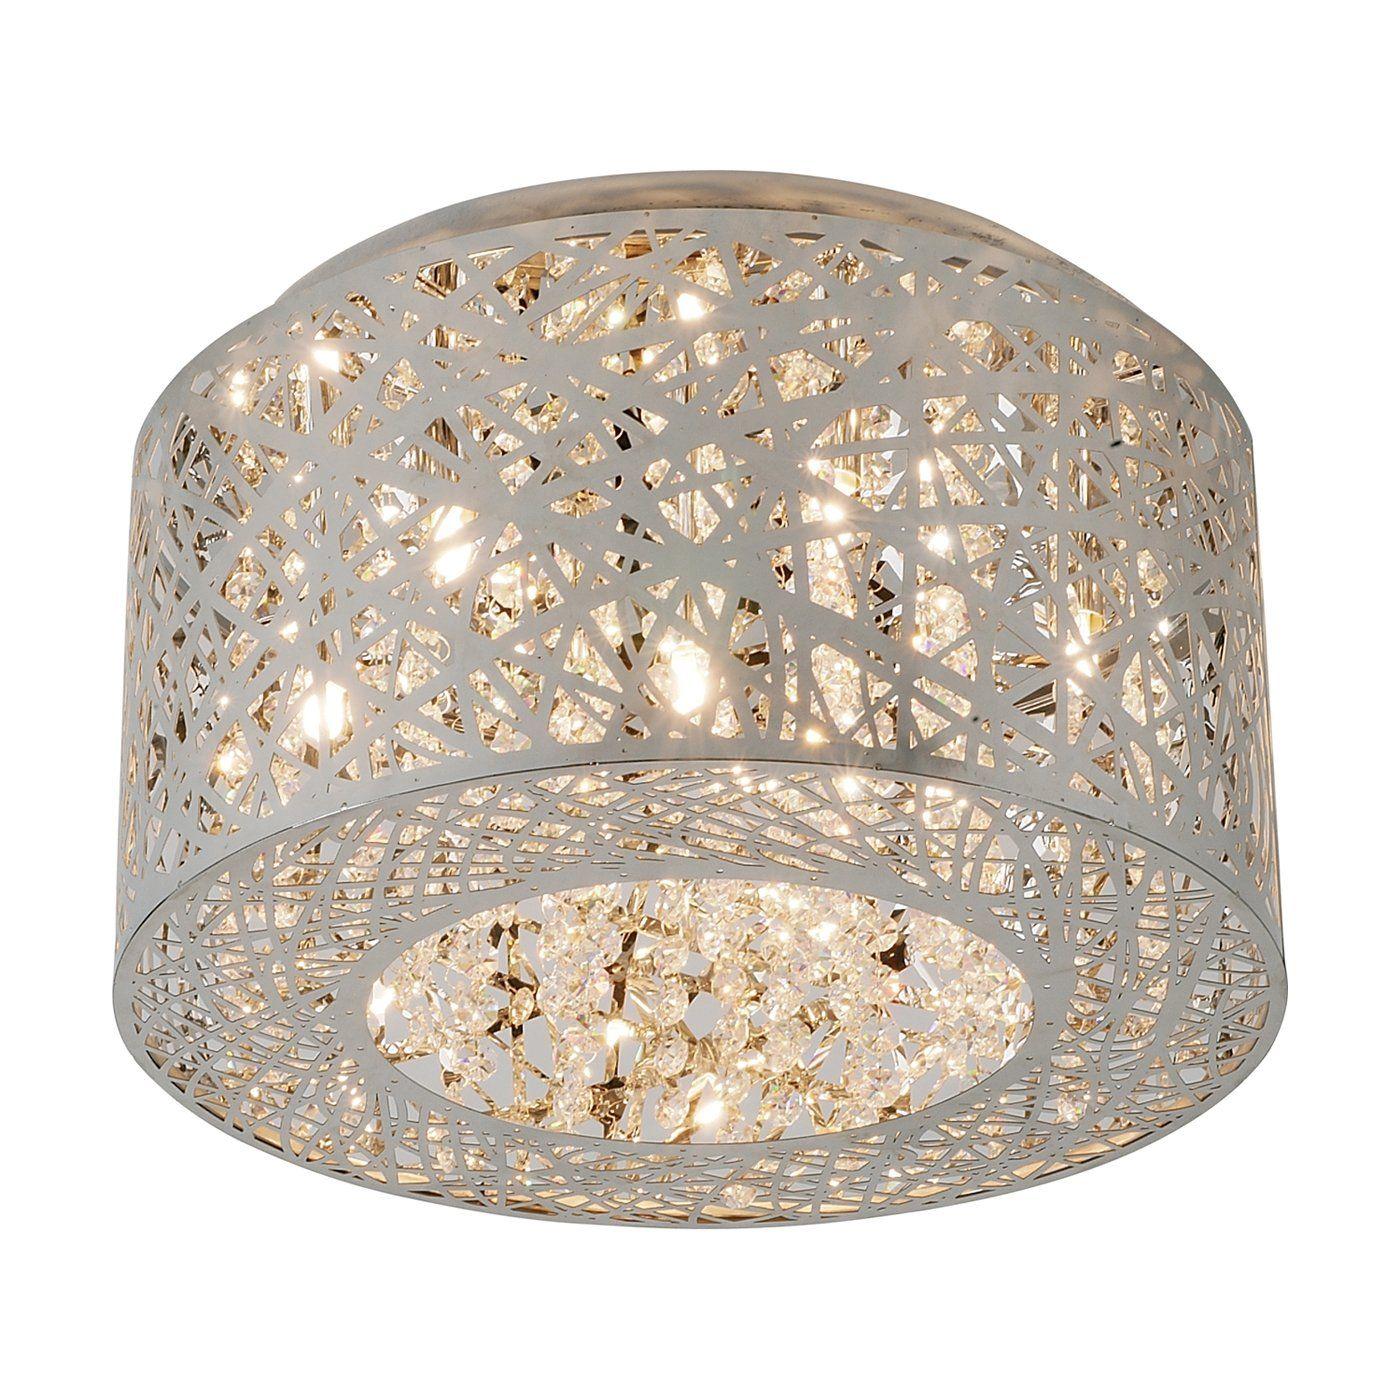 Raum mit lichtern et lighting epc  light inca flush mount ceiling light